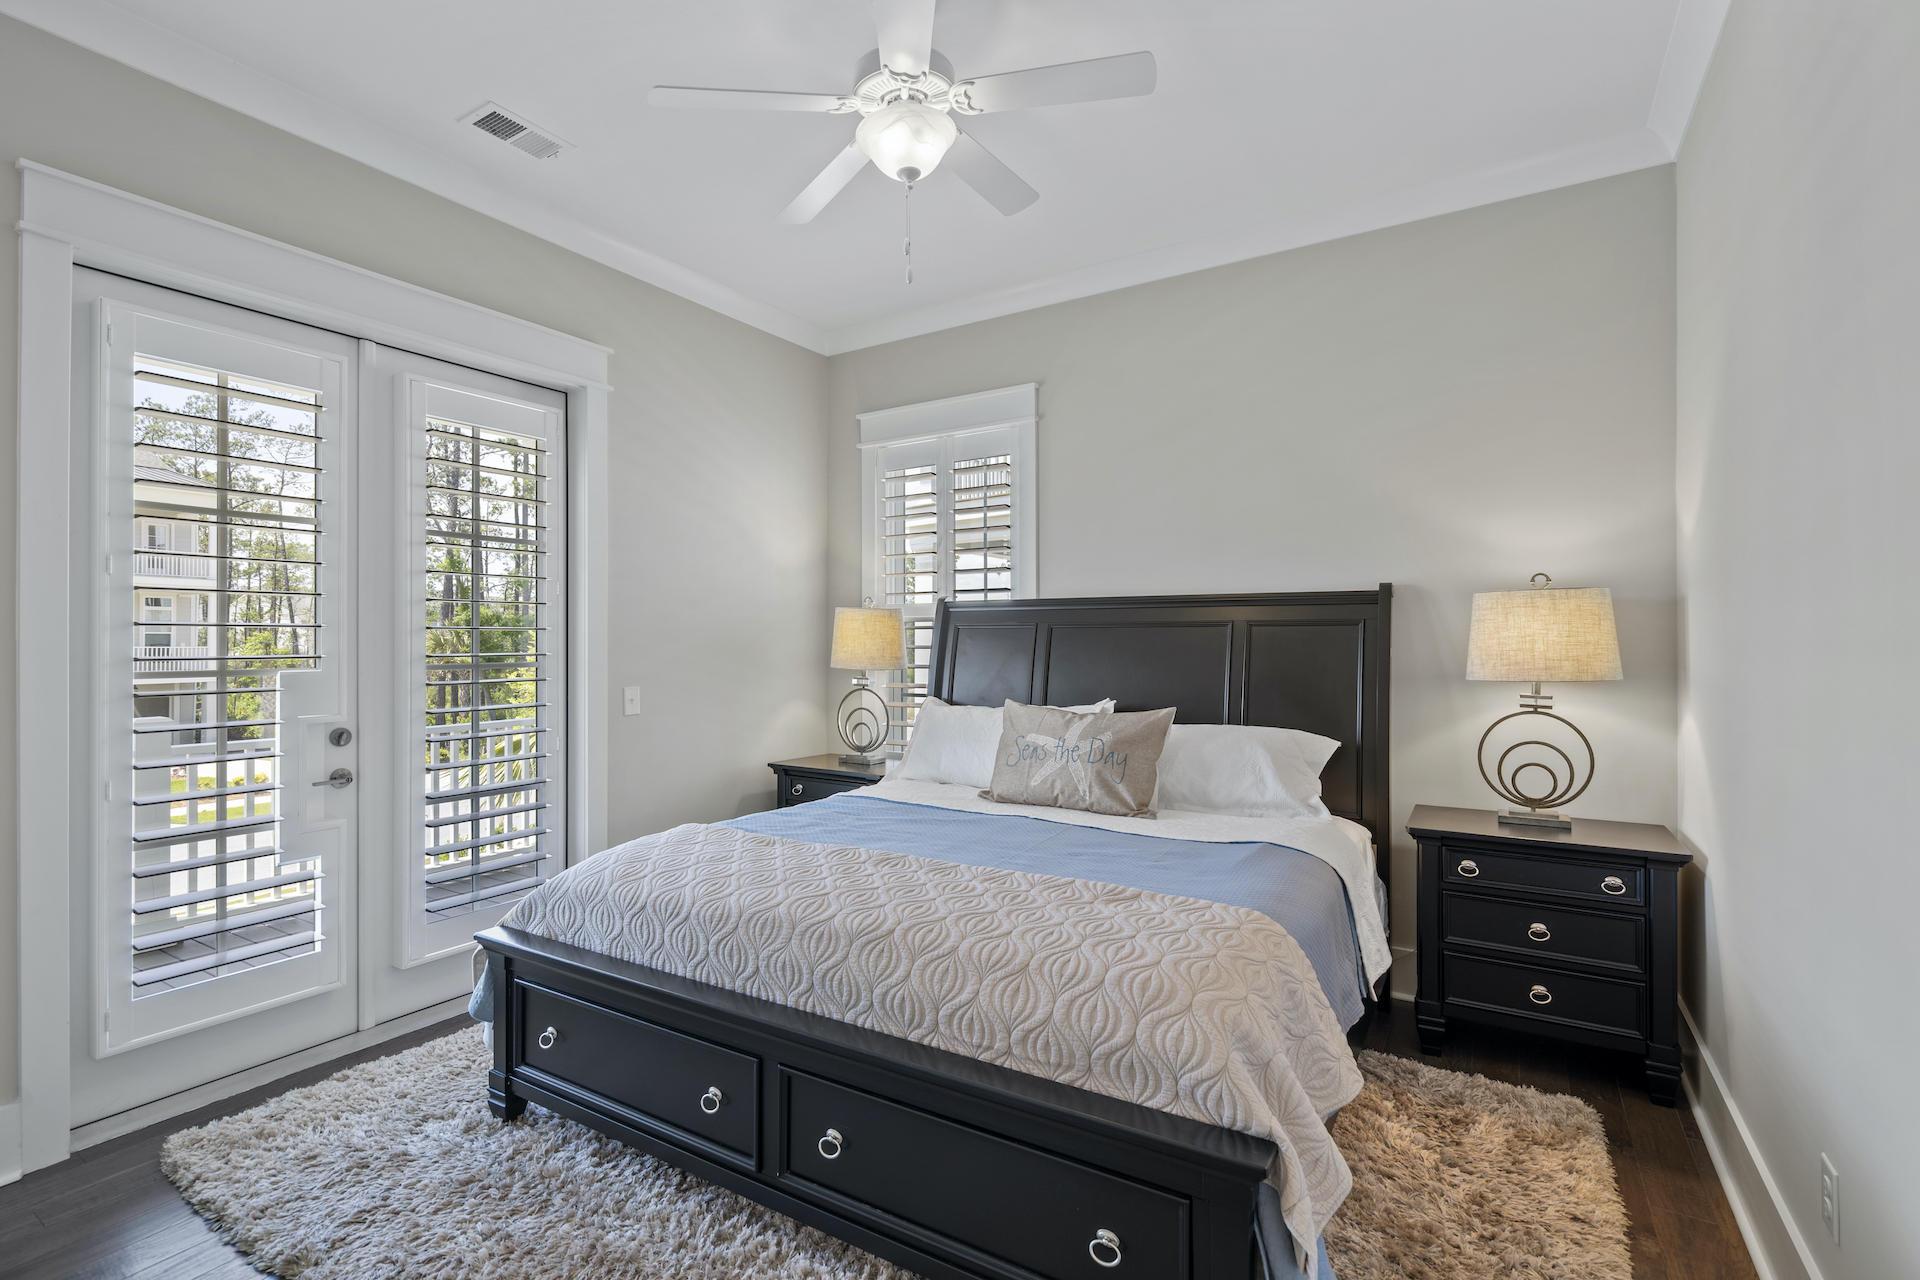 Dunes West Homes For Sale - 2316 Bucktail, Mount Pleasant, SC - 42